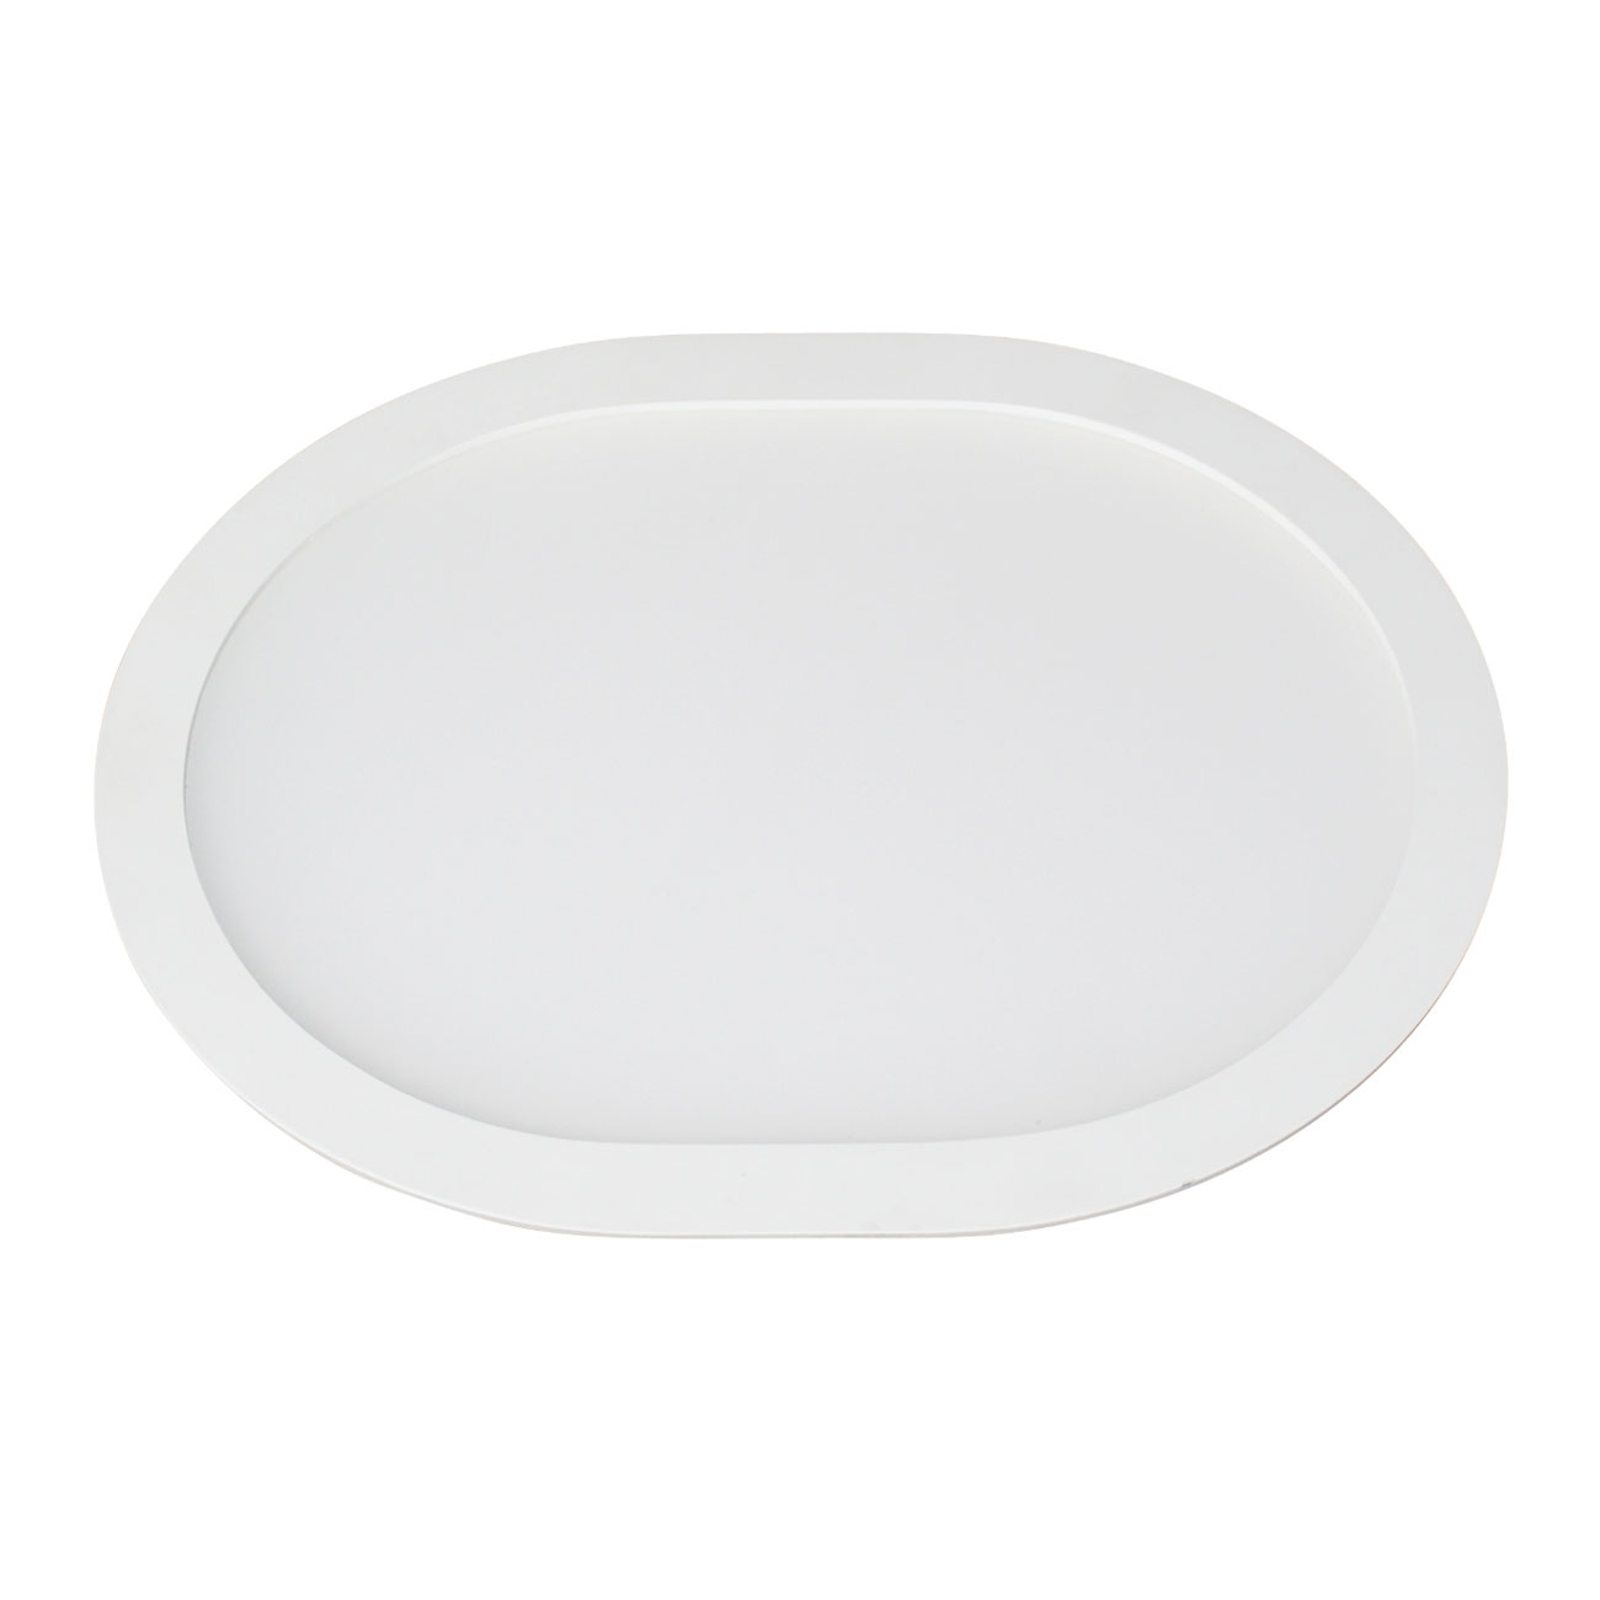 LED-uppopaneeli Ovale, 3 000 K, 26 cm x 21,6 cm